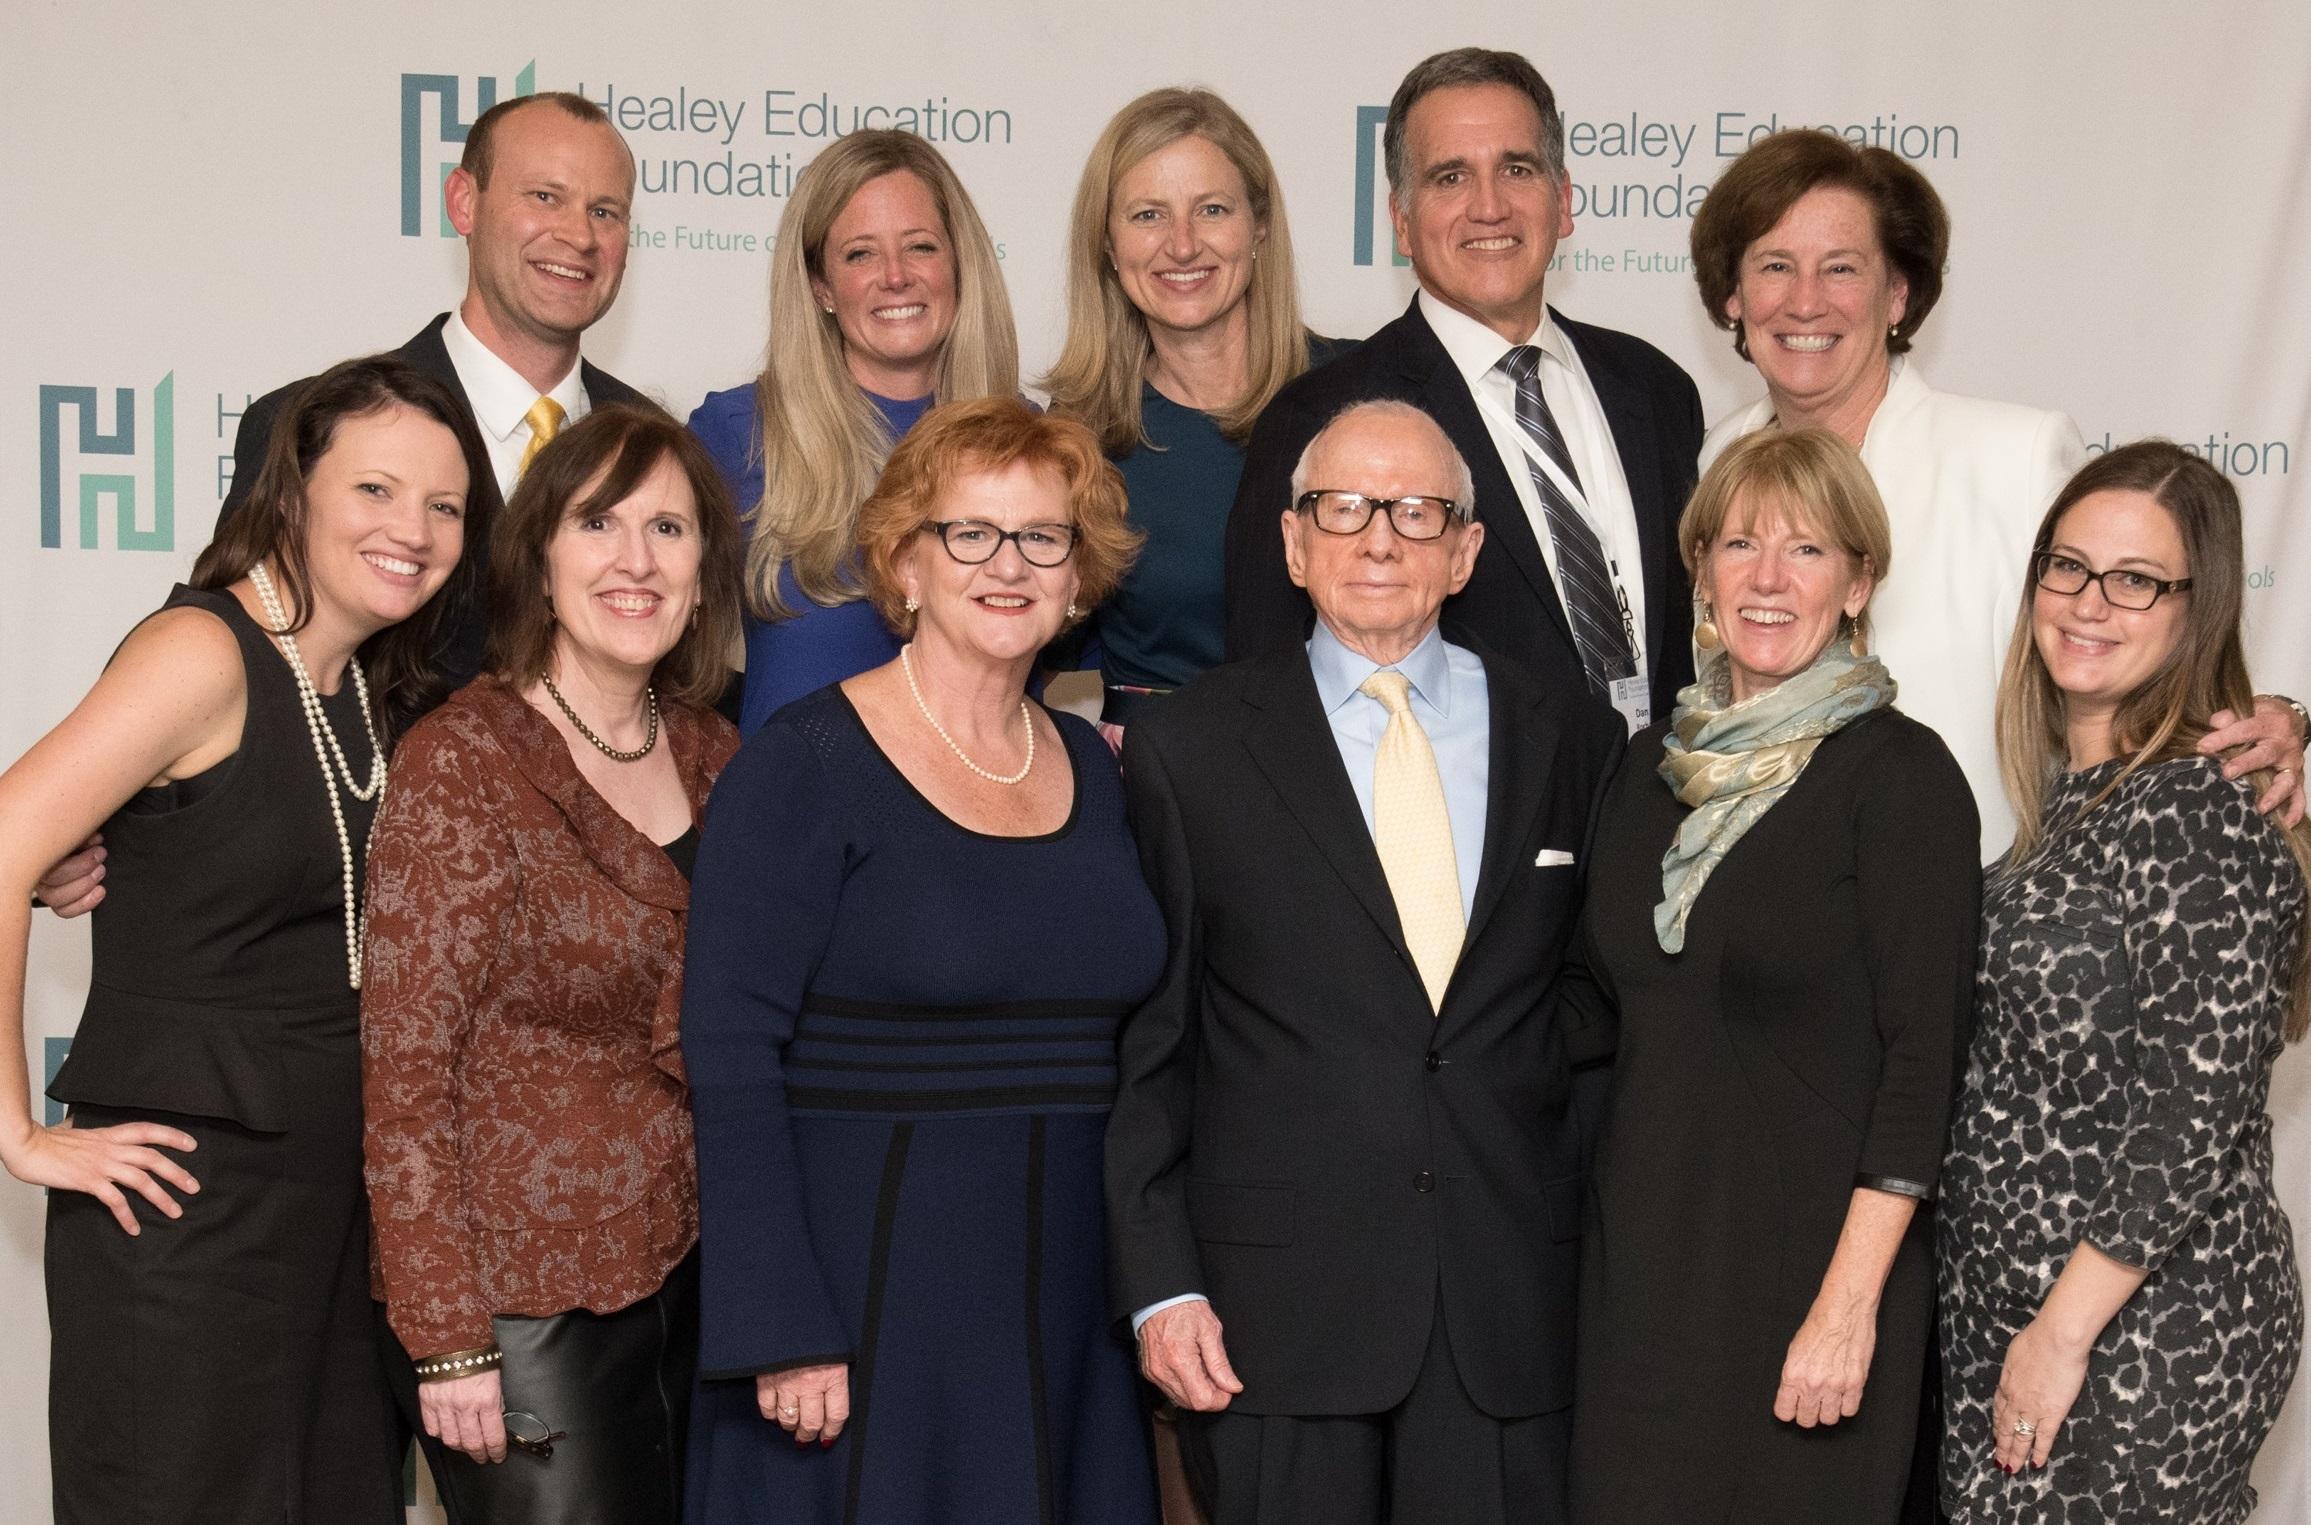 Healey Education Foundation Team